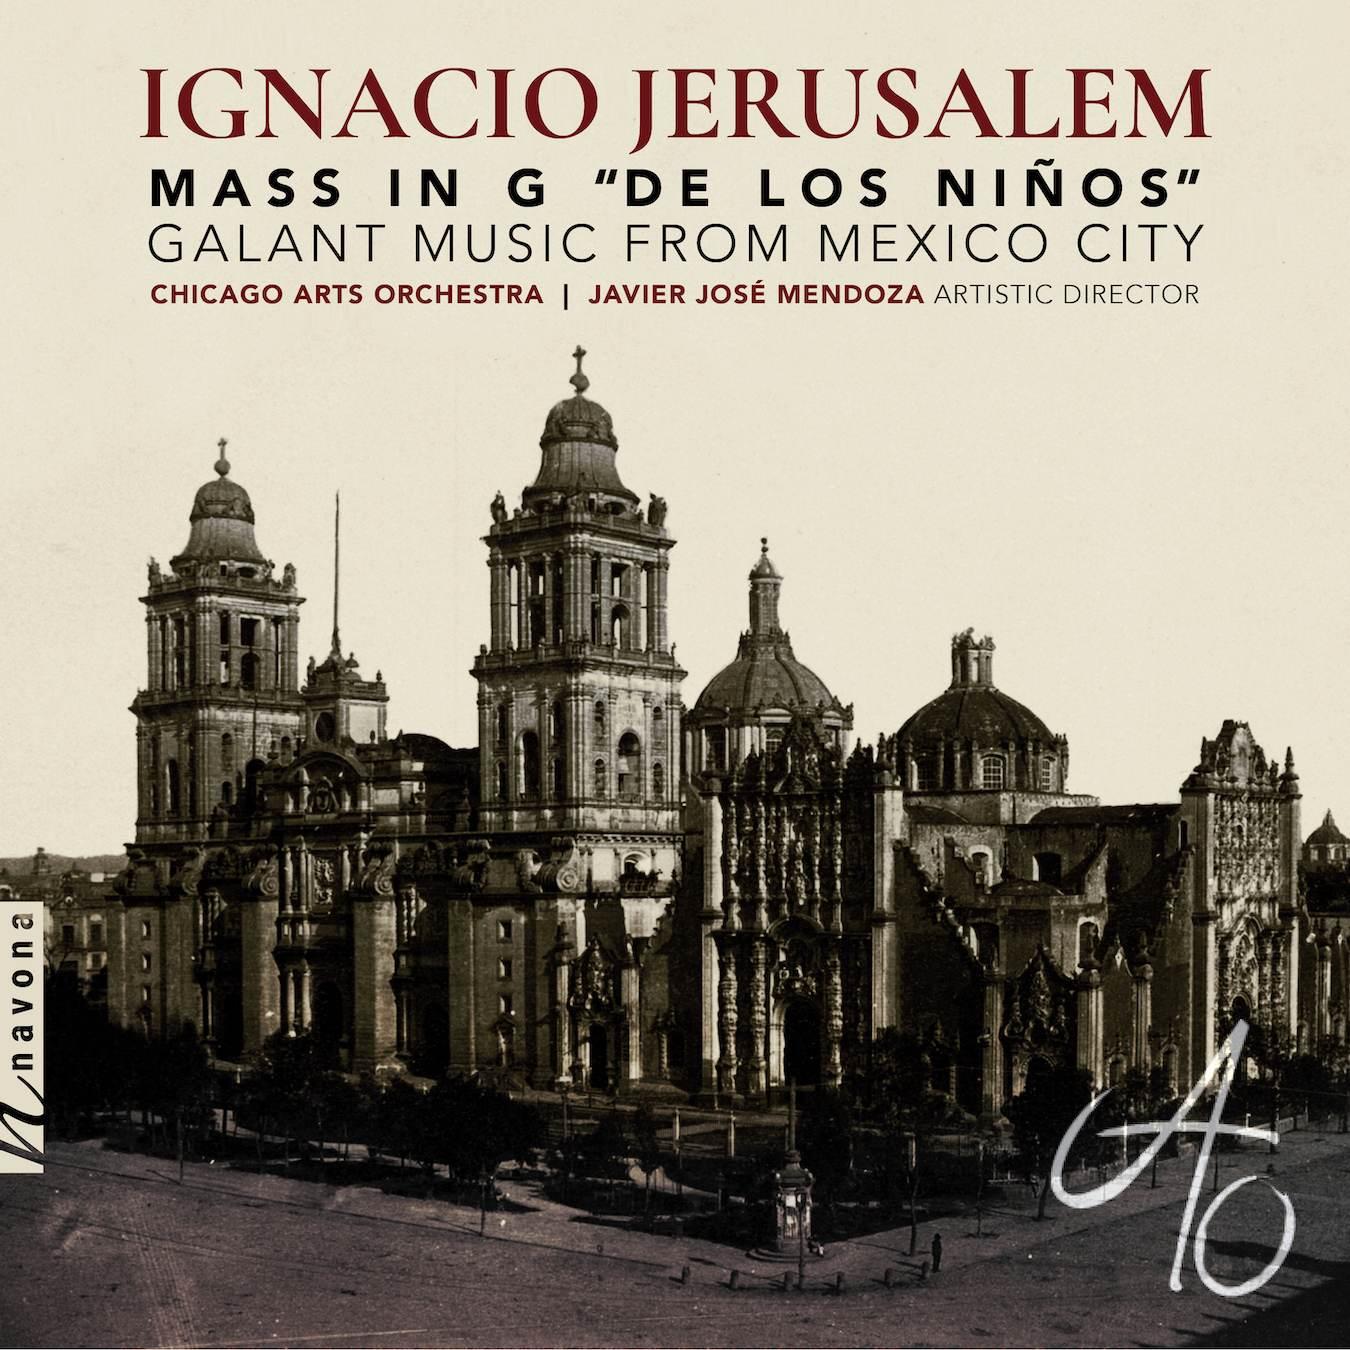 Chicago Arts Orchestra Mexico City album cover